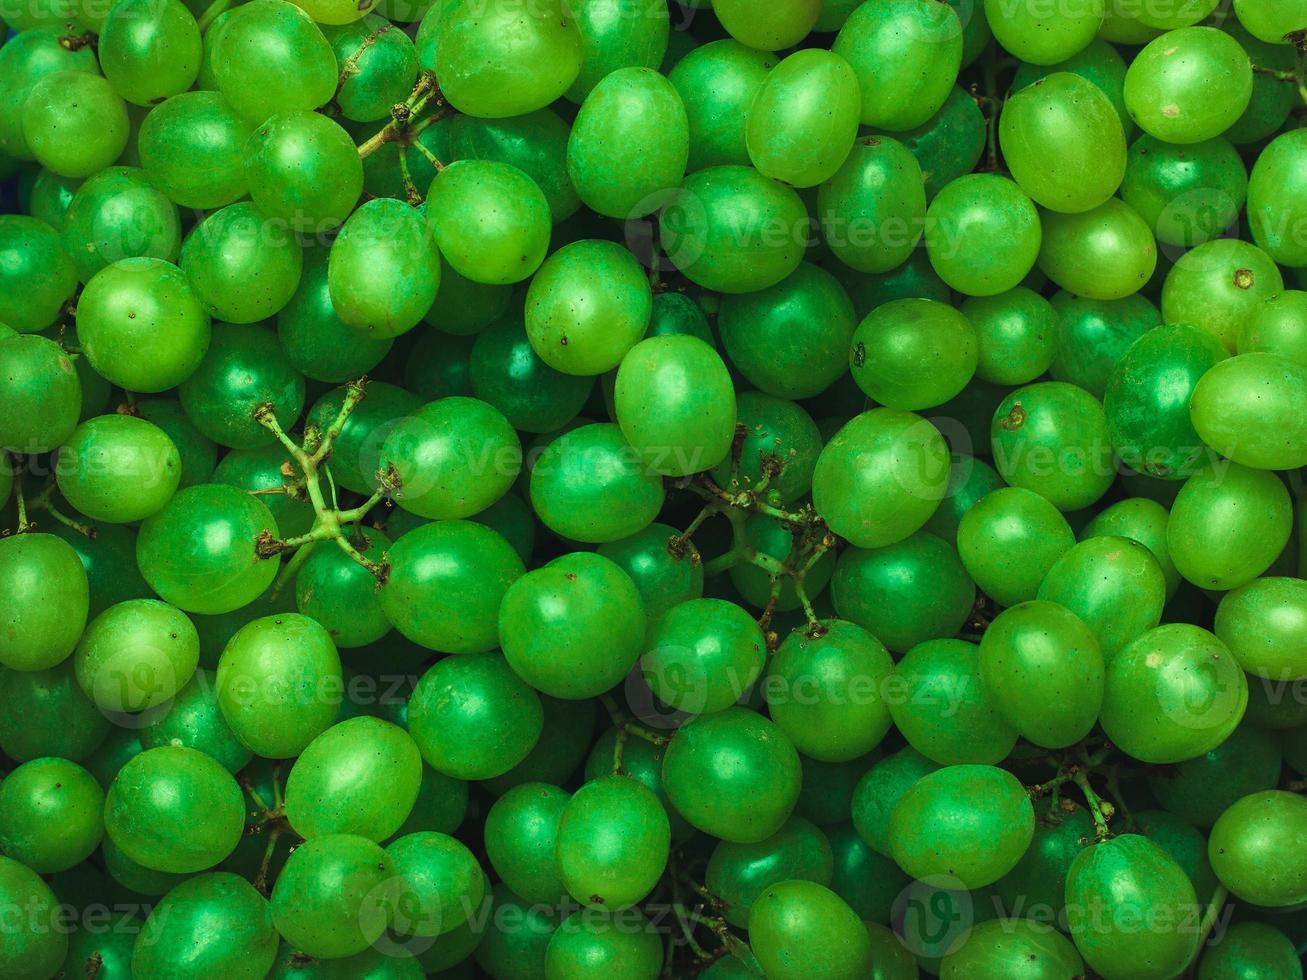 stora gröna druvor. foto